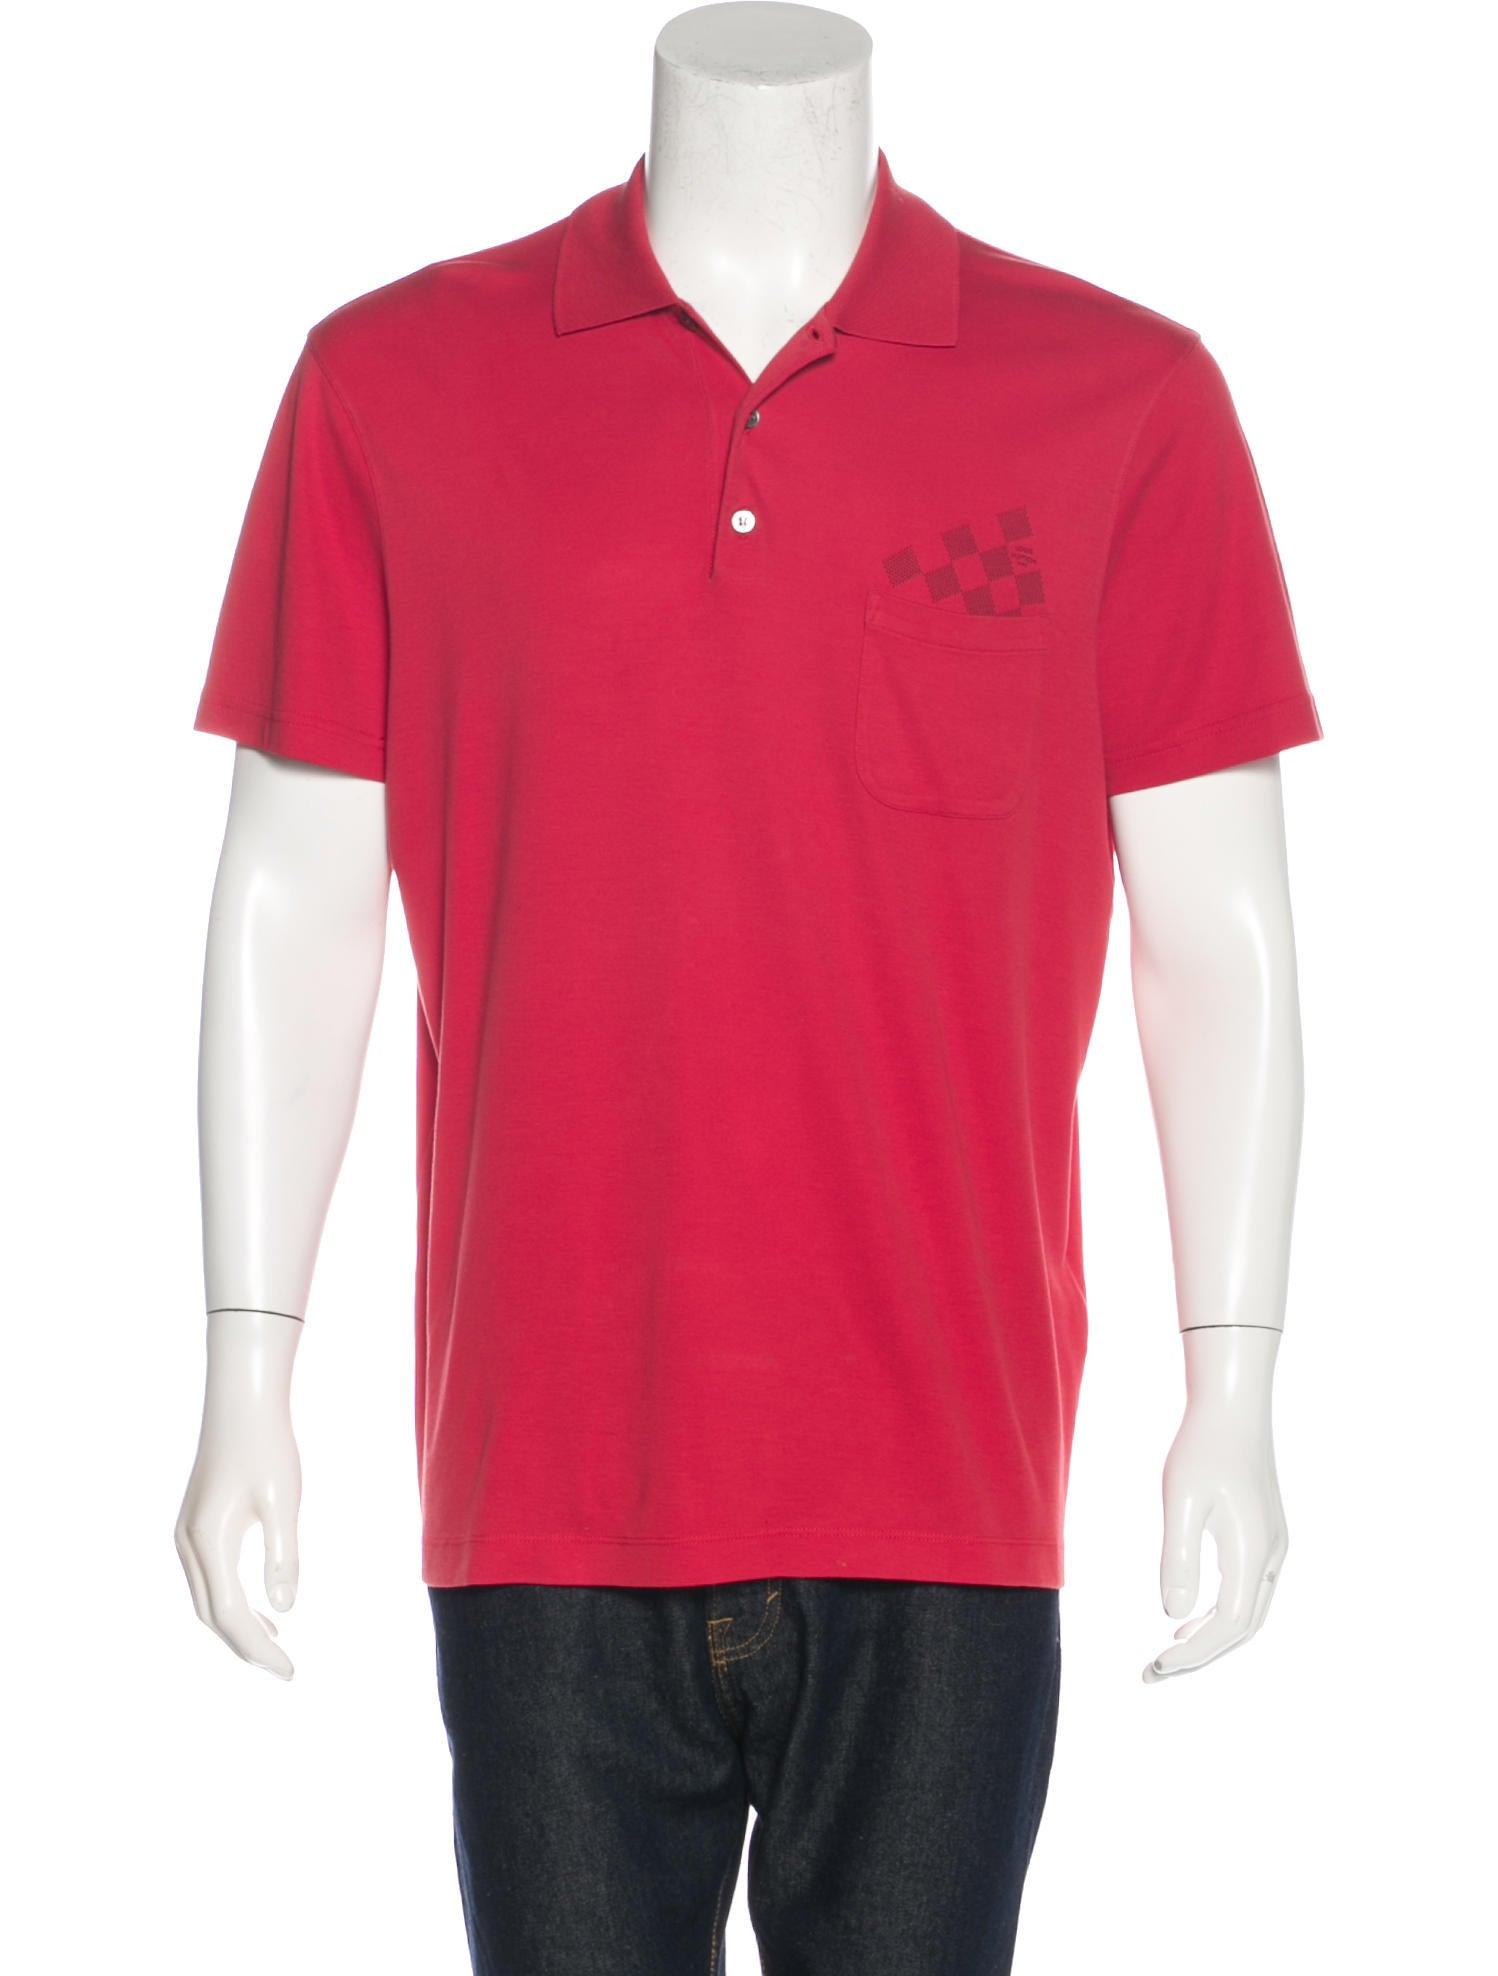 Louis Vuitton Mens Damier Polo Shirt T Shirt Design 2018